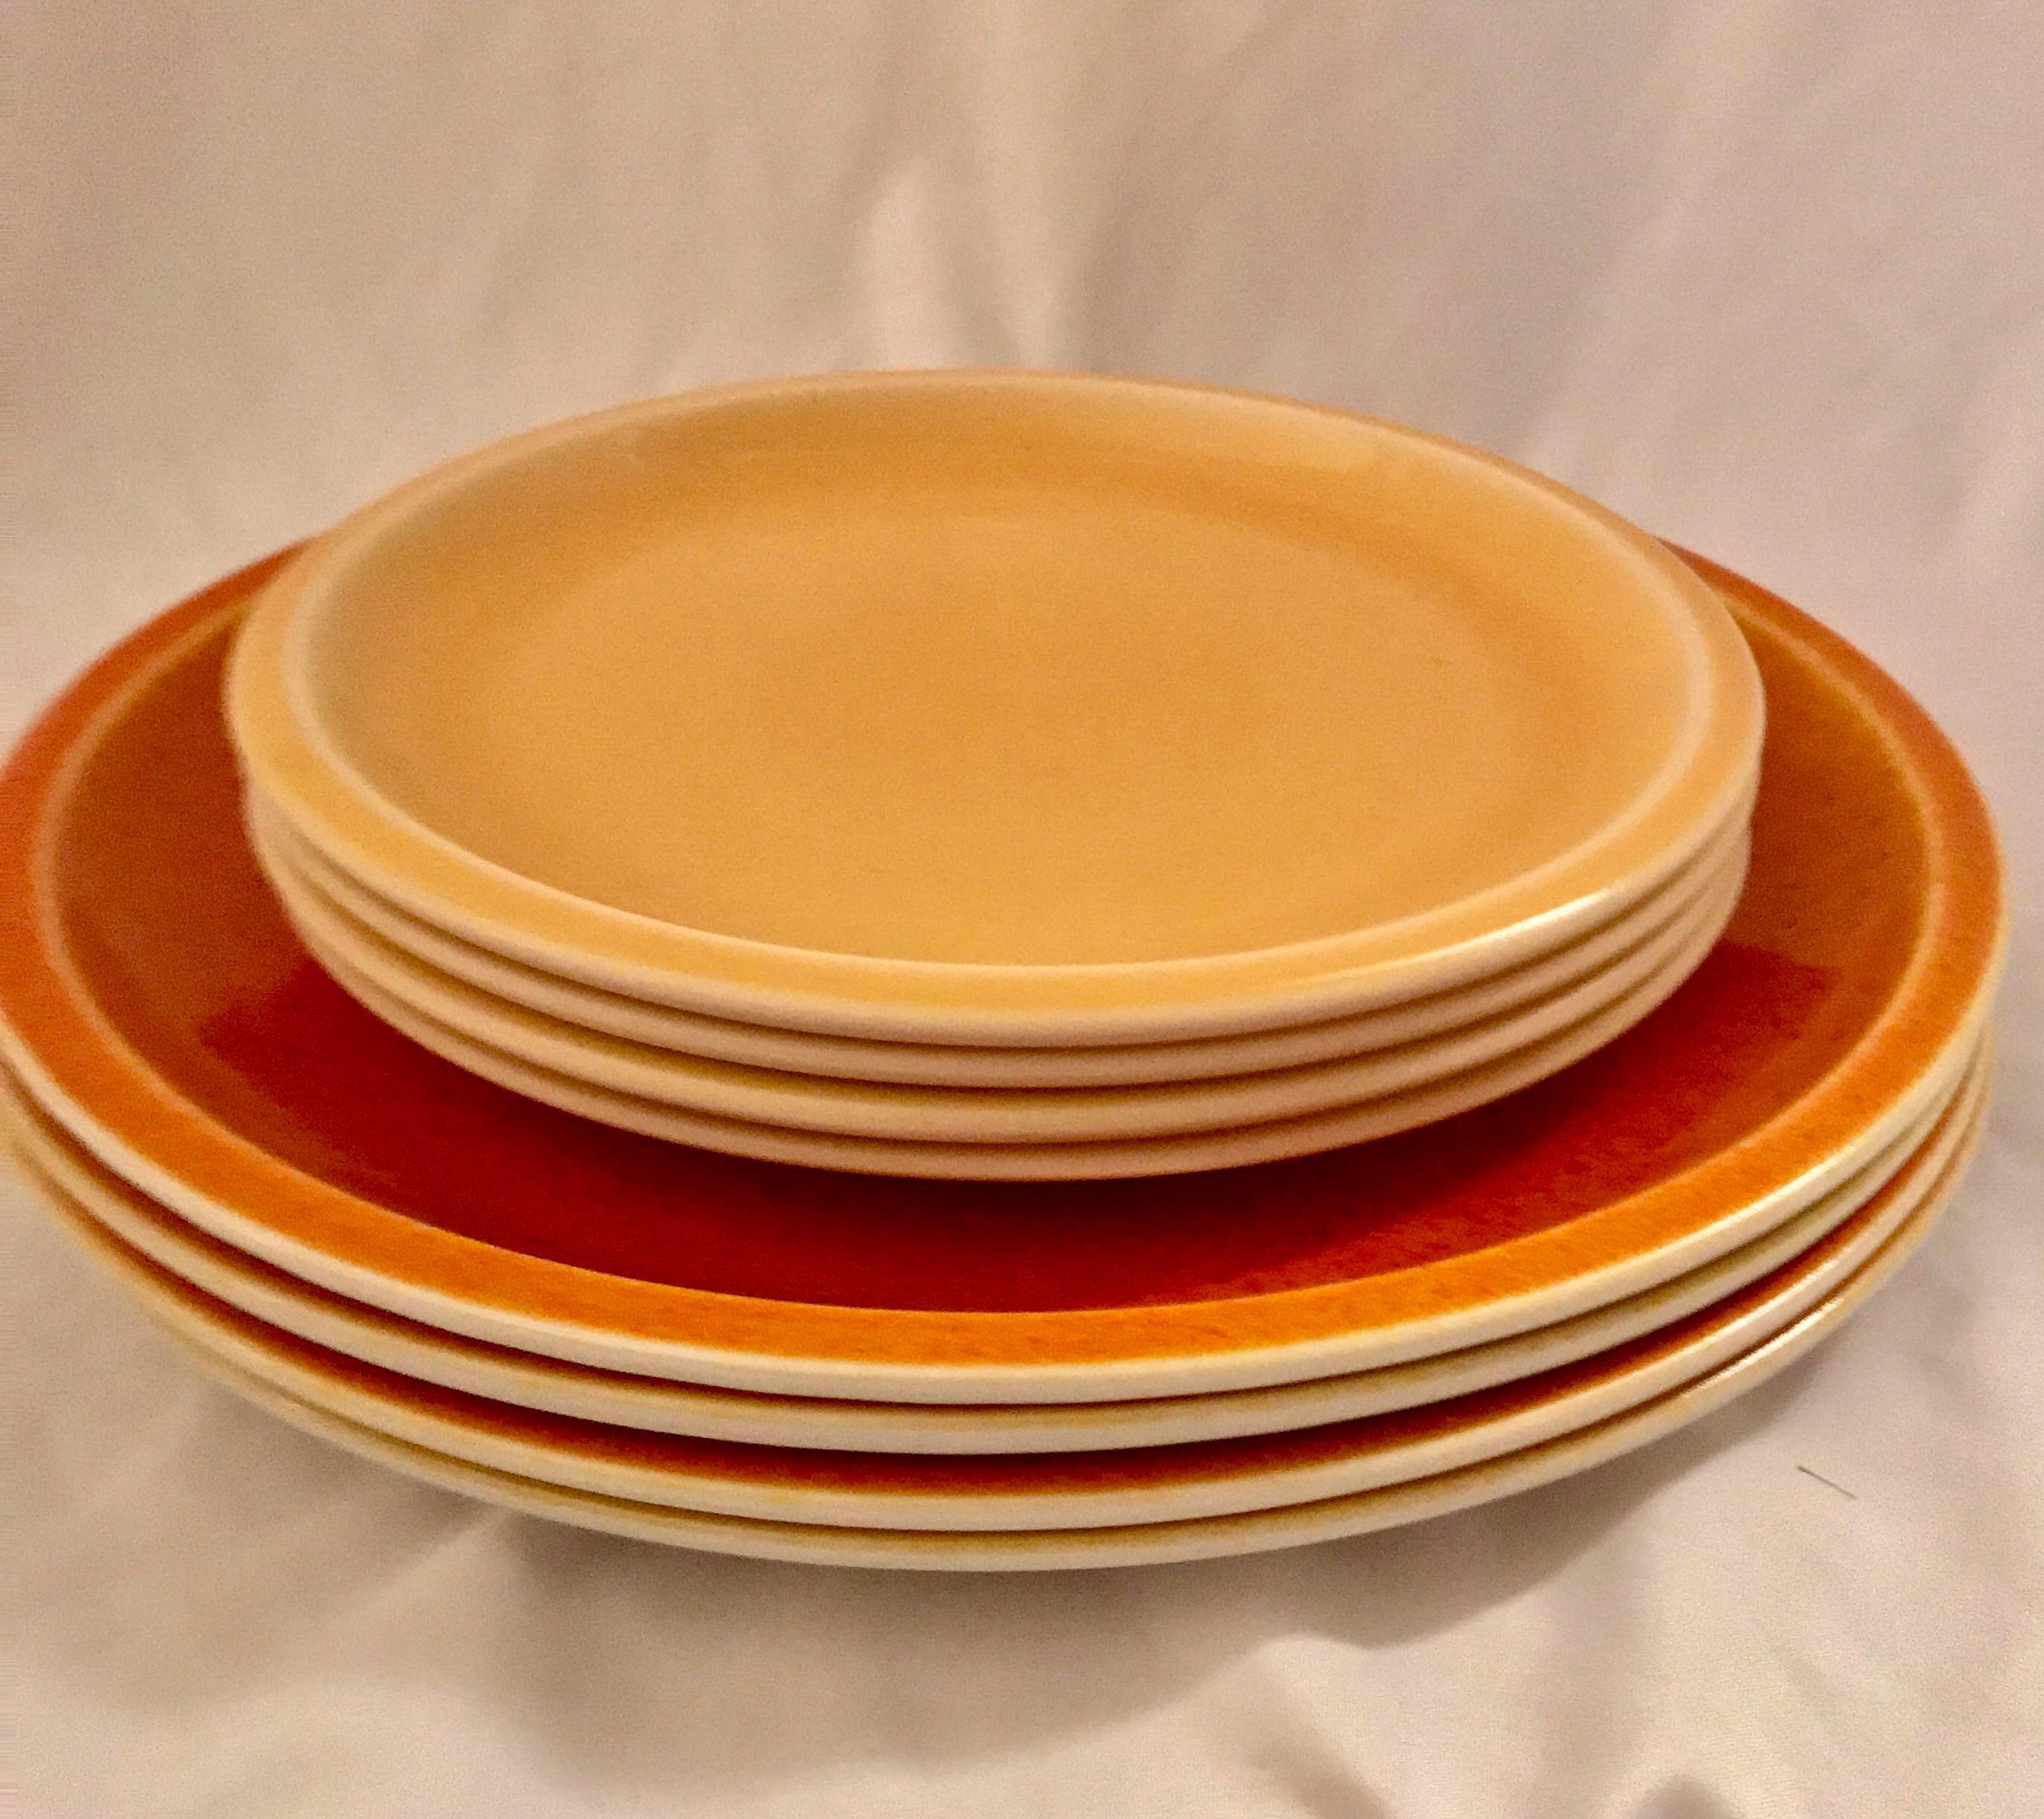 Jars of France Orange Dinner Plates \u0026 Yellow Salad Plates - 8 Pieces - Image 3 & Jars of France Orange Dinner Plates \u0026 Yellow Salad Plates - 8 Pieces ...